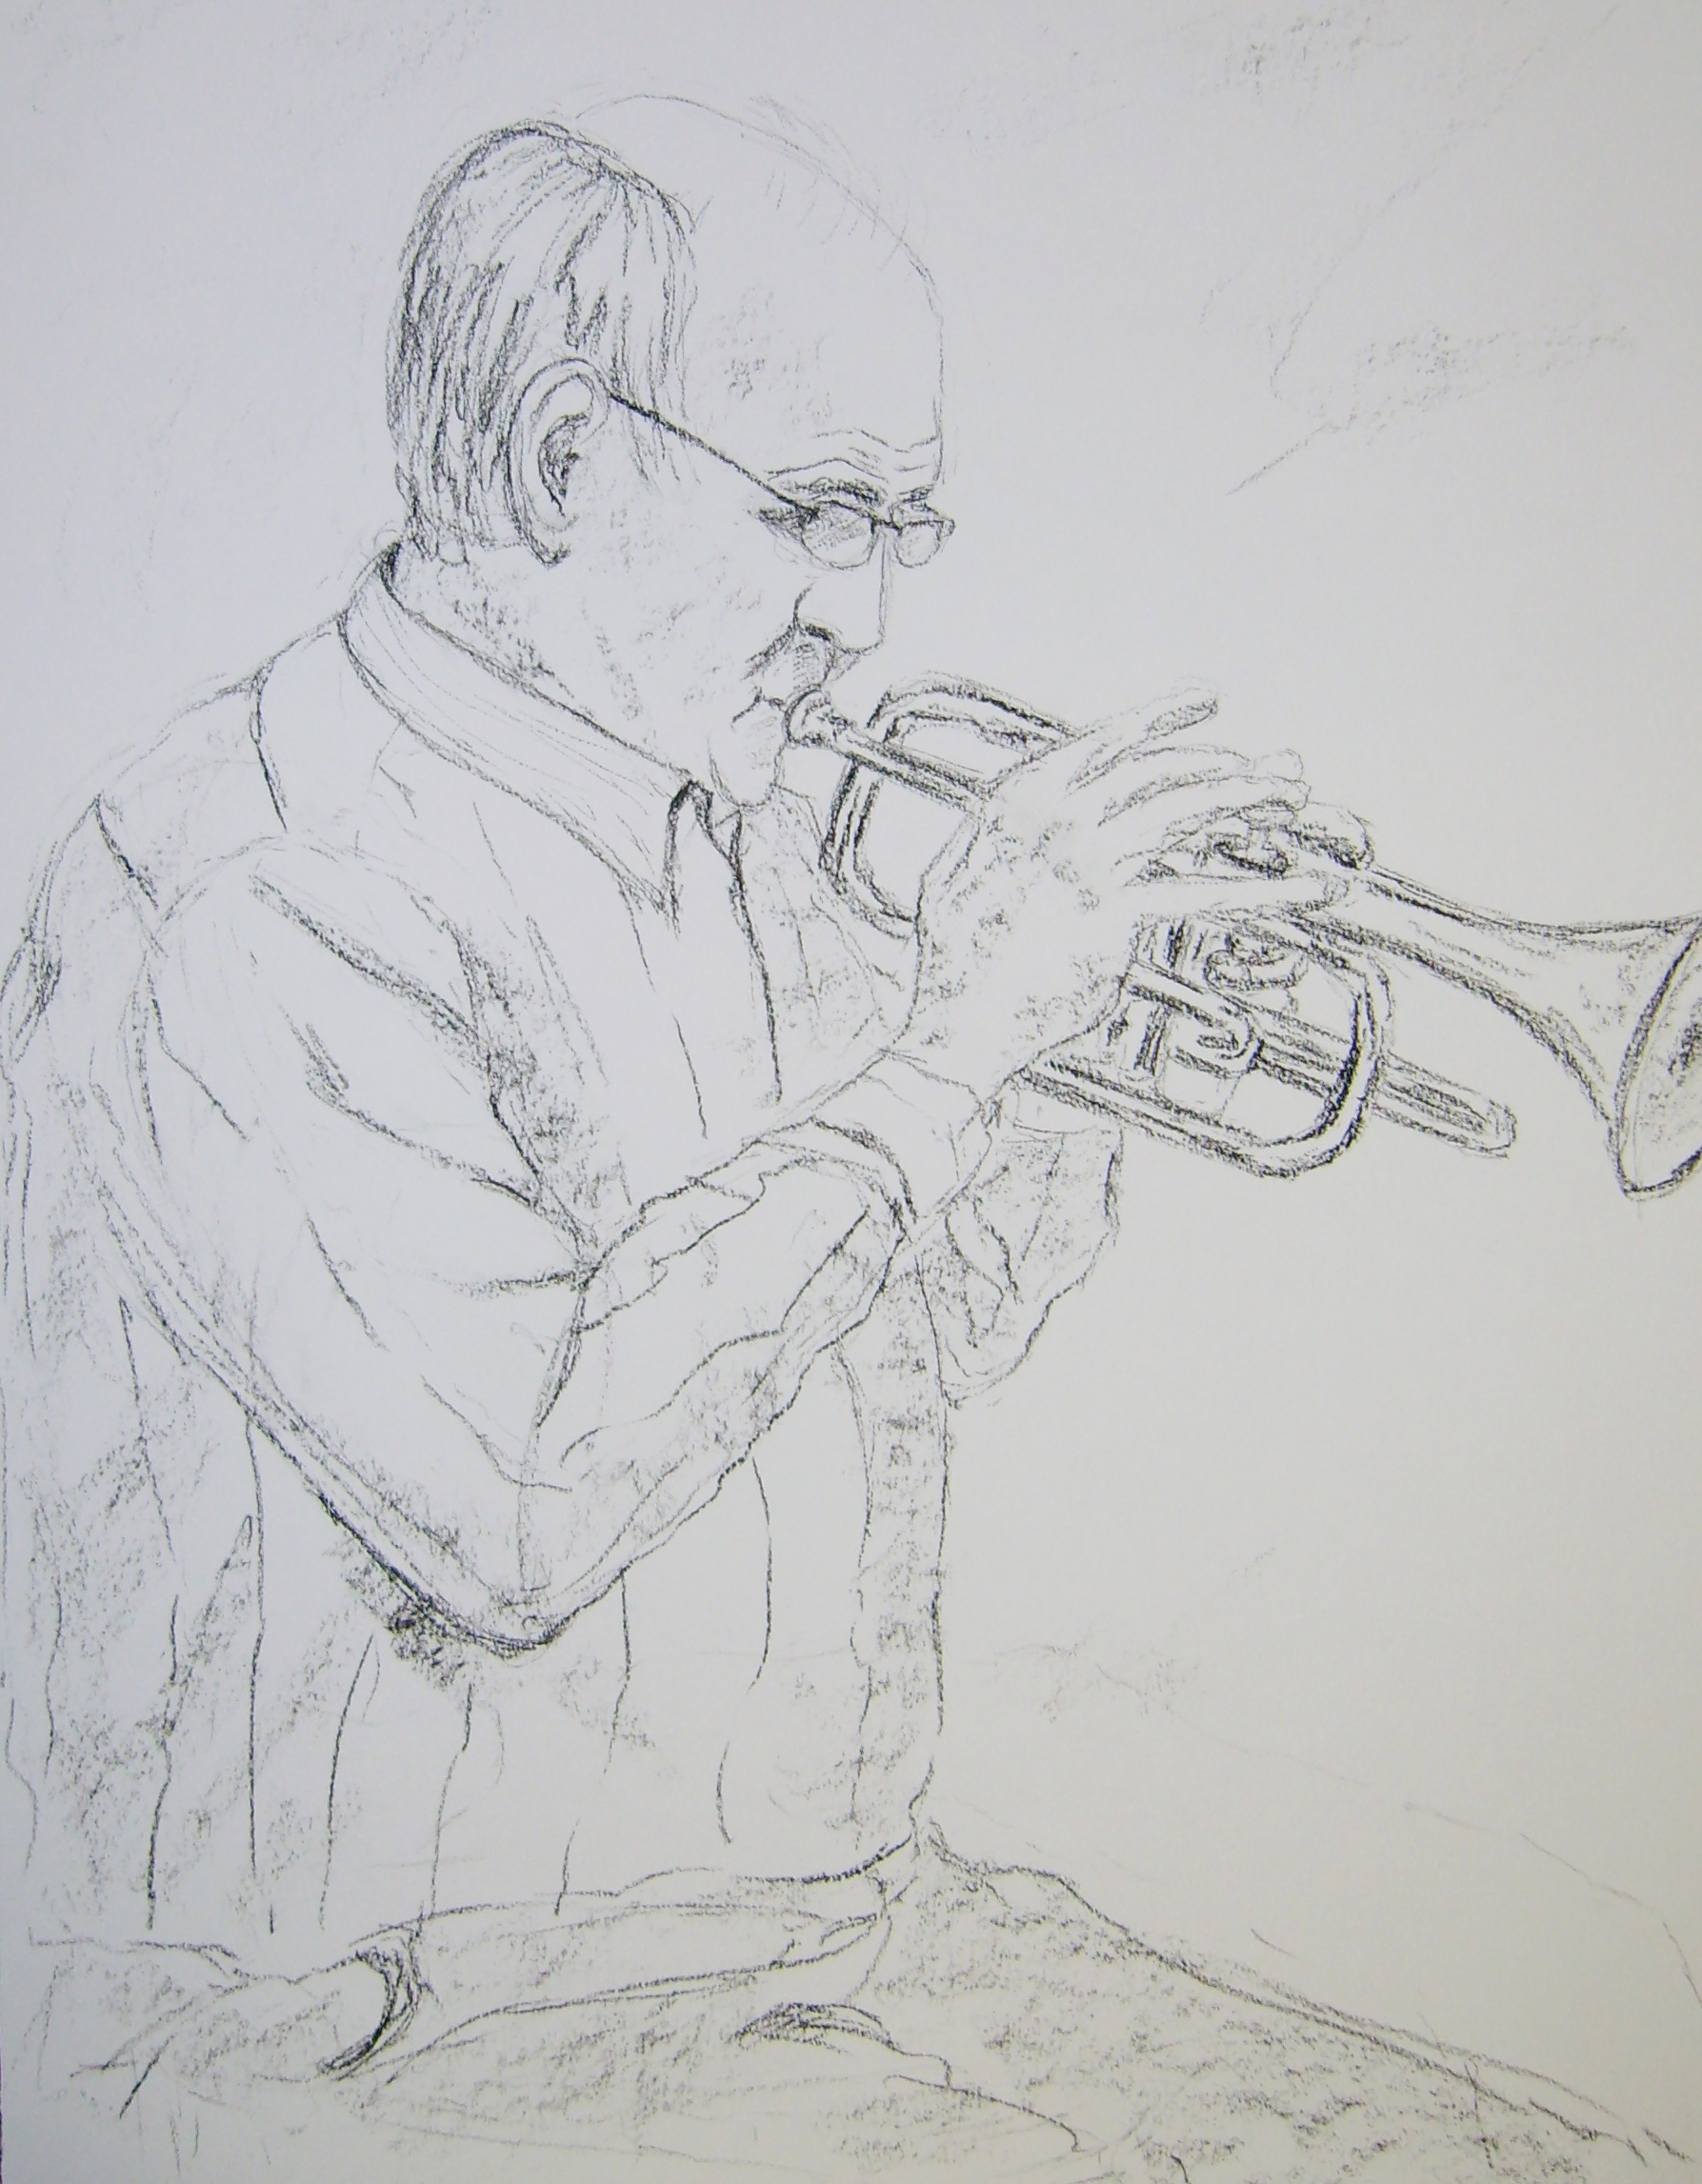 Jan playing the cornet